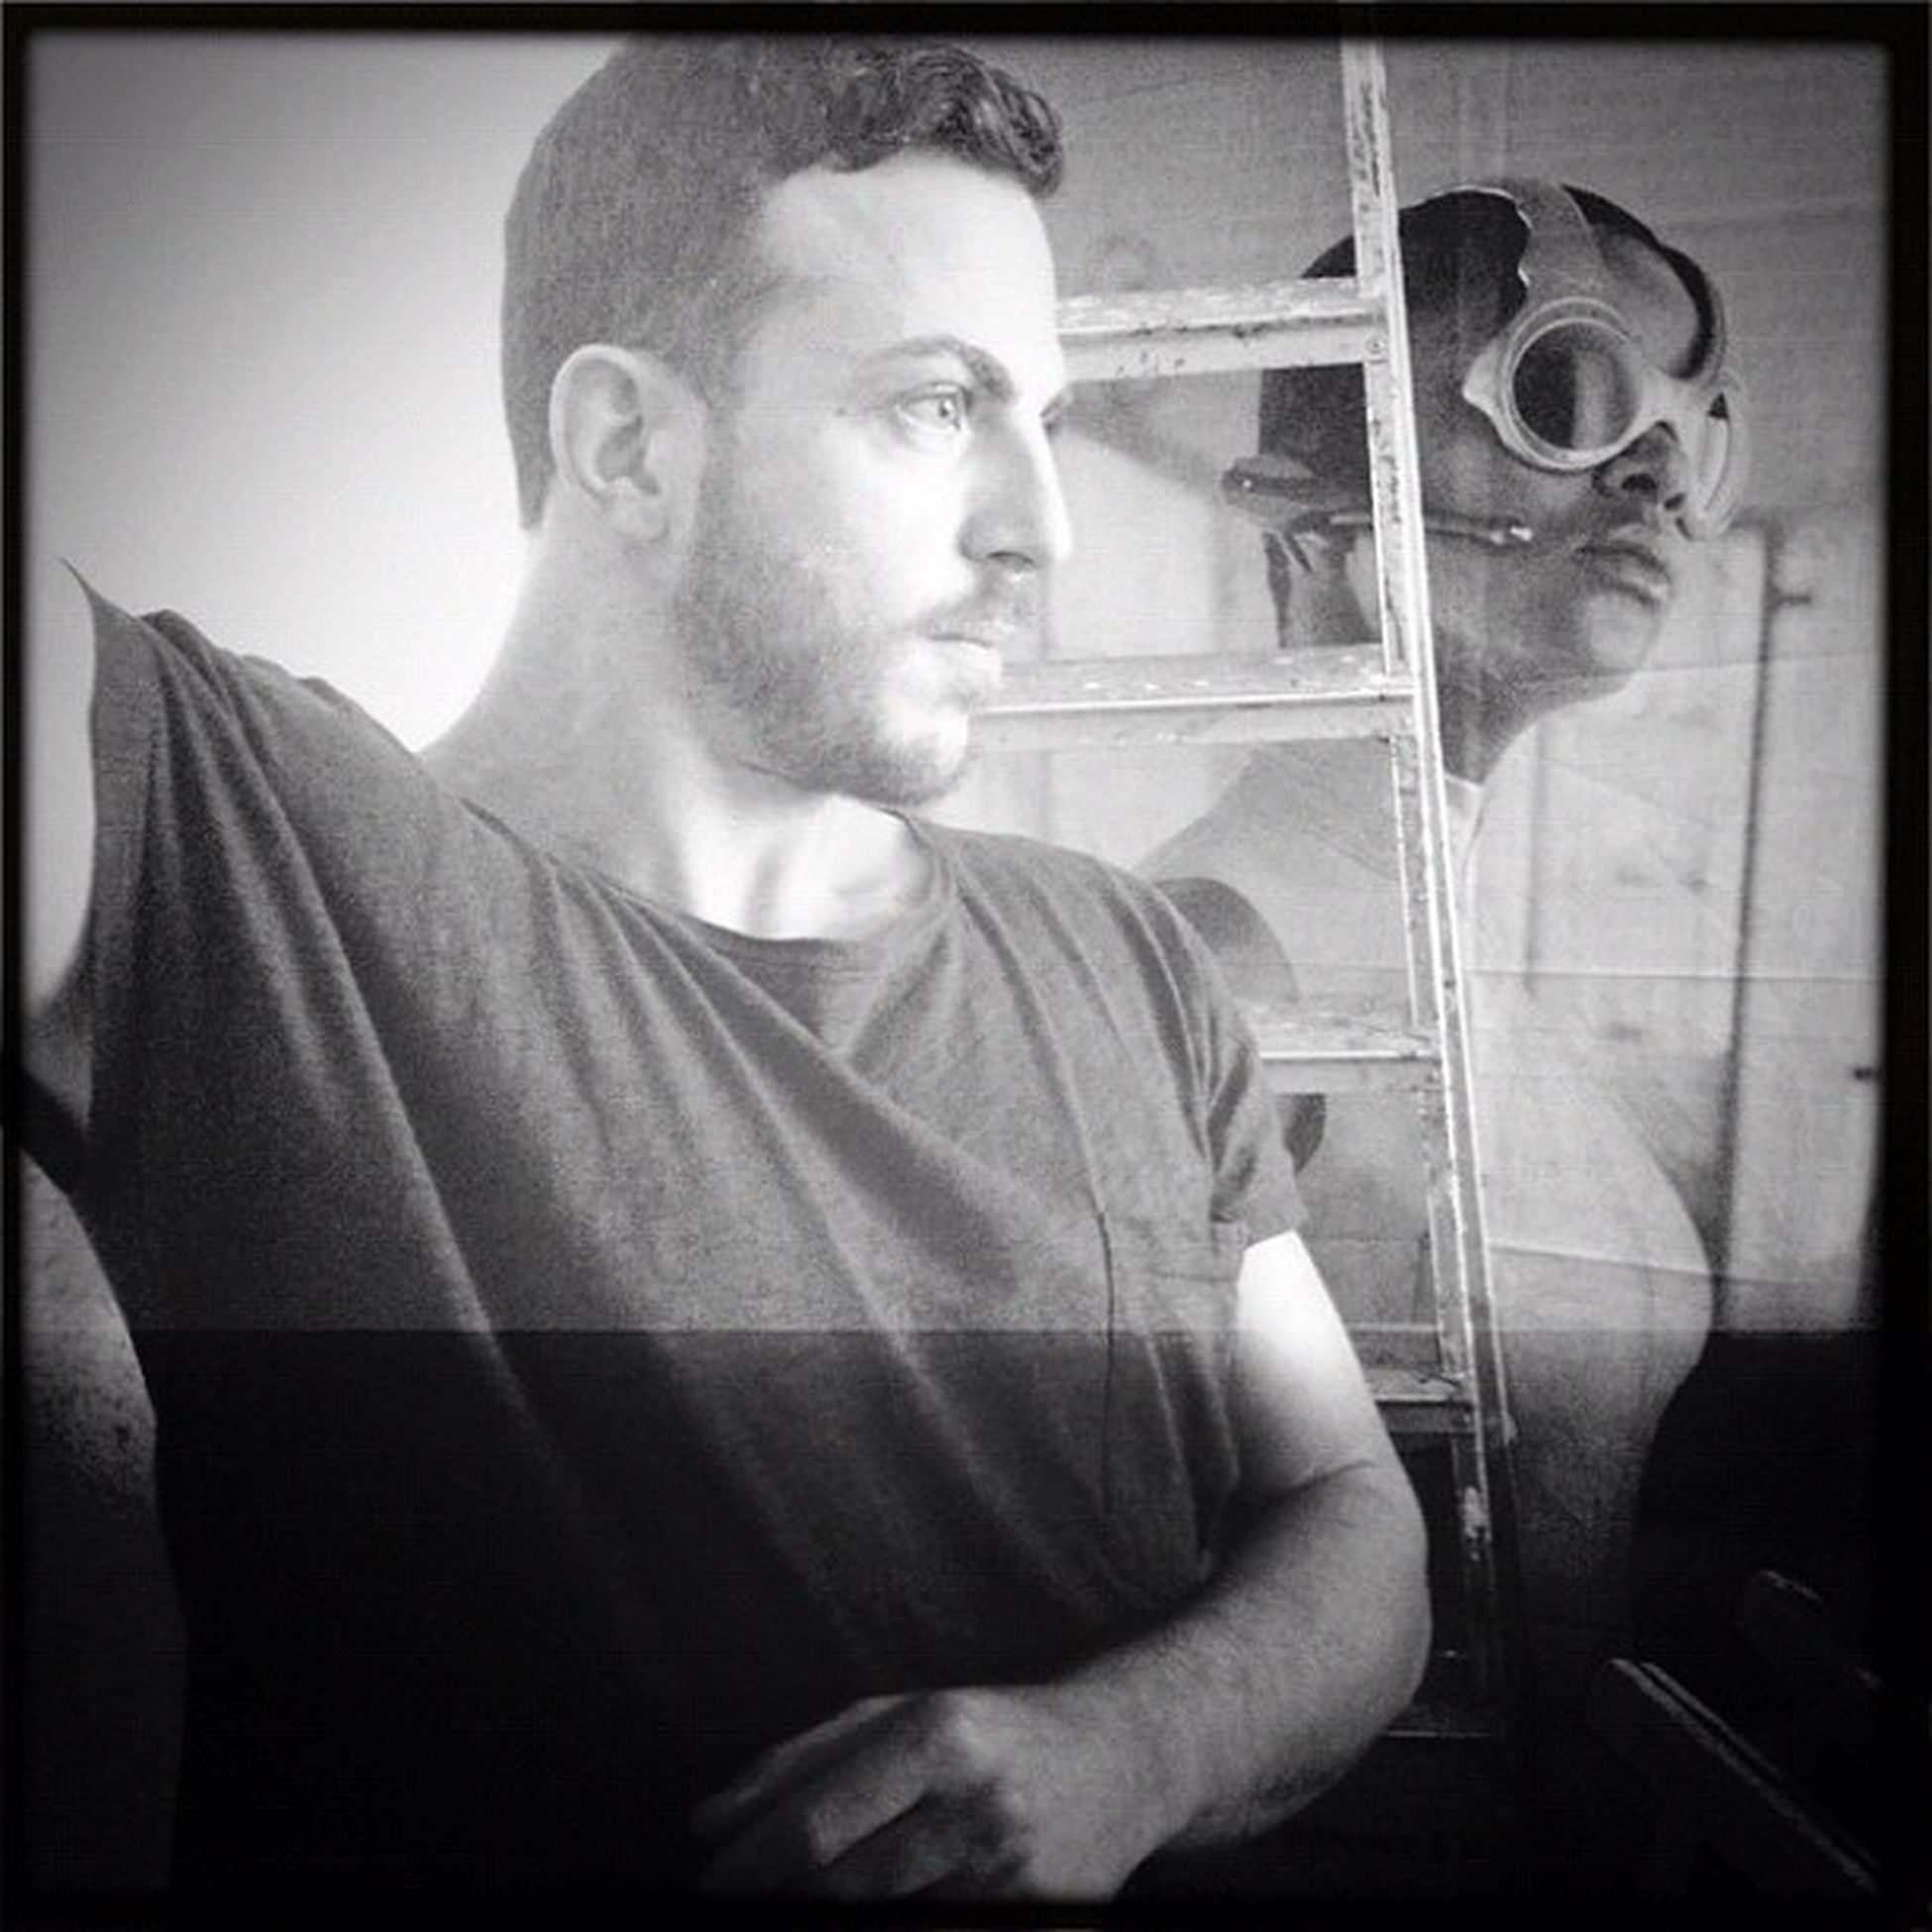 shooting with @alcarlino at Neroscurostudio for @vanillaskyrock Vanillasky